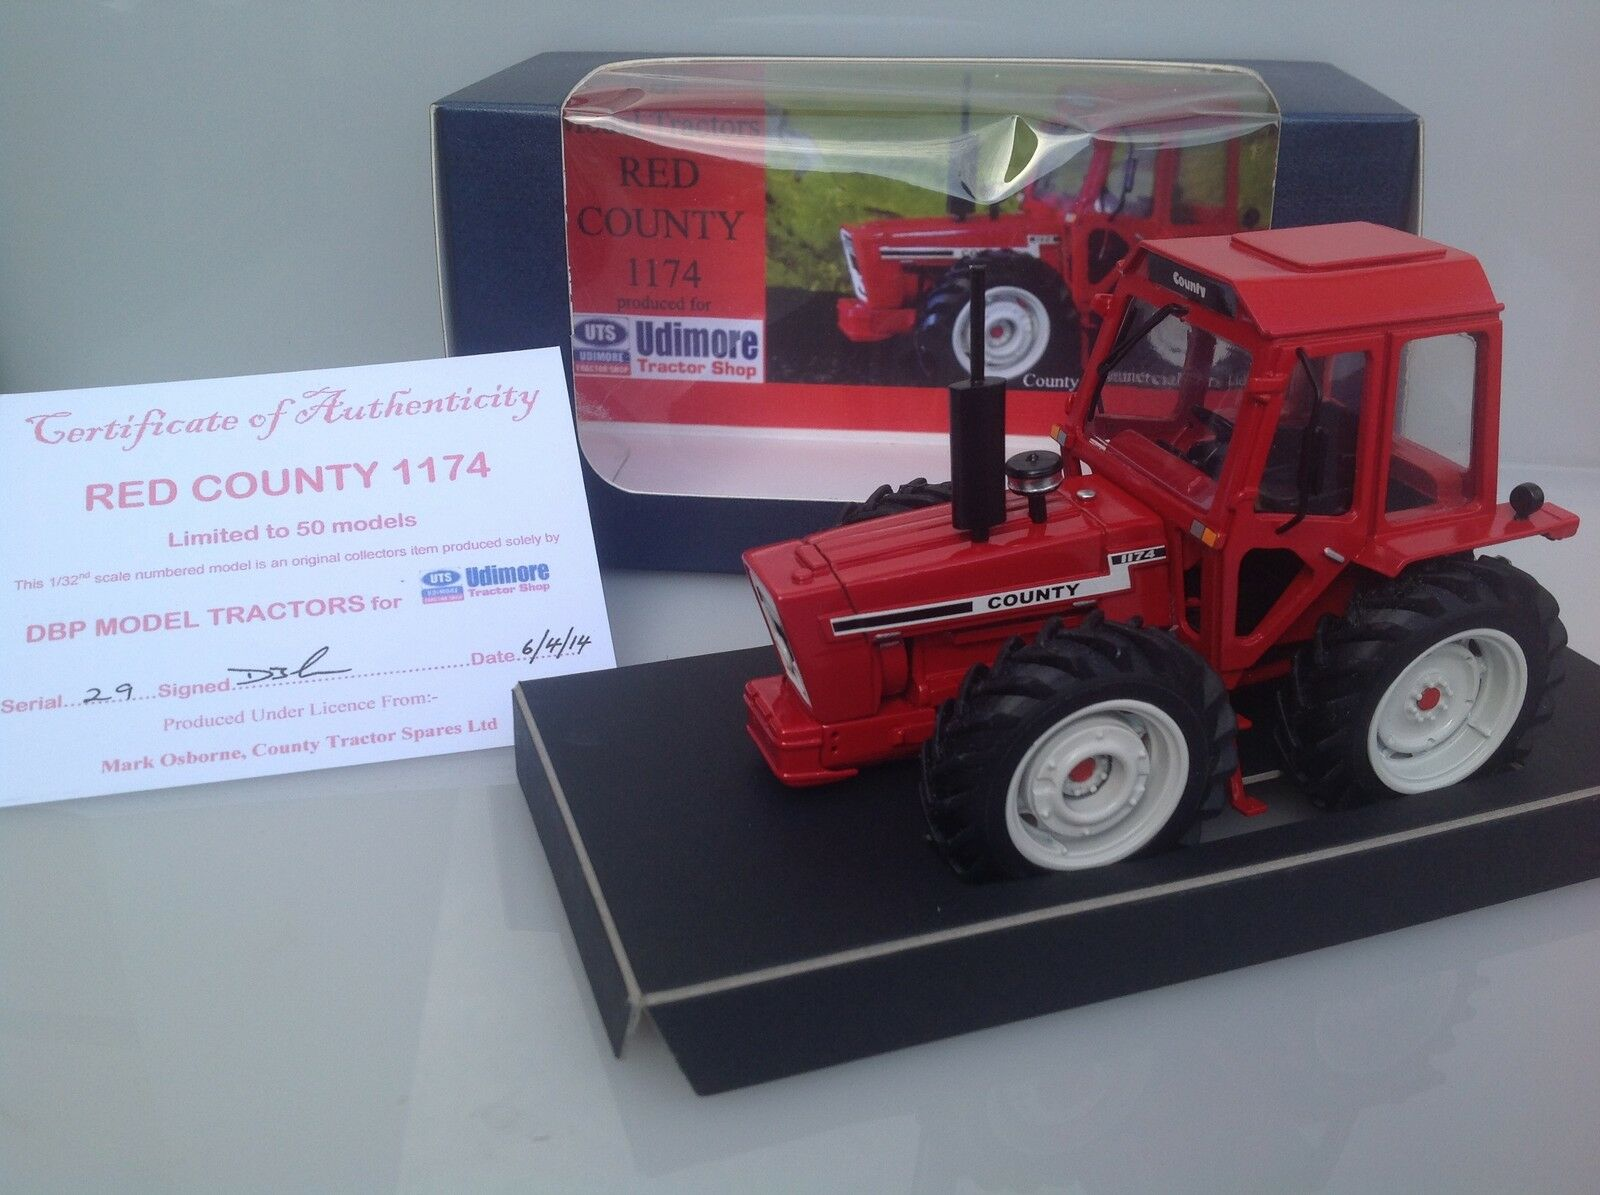 Udimore Tractor Shop Ltd